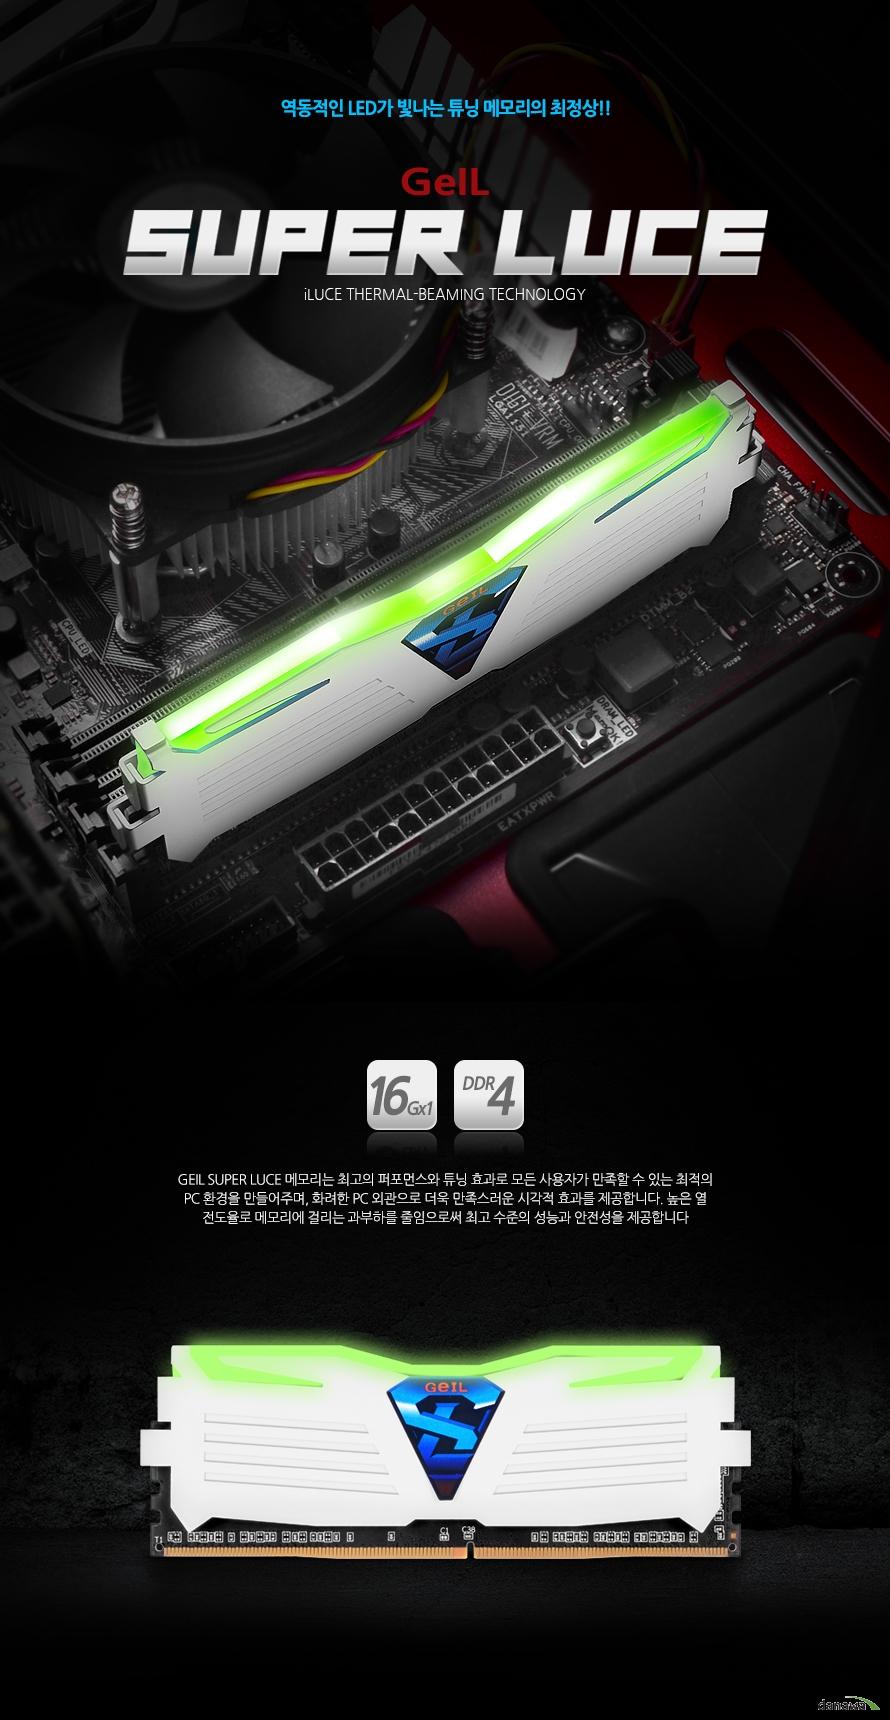 GeIL DDR4 16G PC4-17000 CL15 SUPER LUCE WHITE 그린GEIL SUPER LUCE 메모리는 최고의 퍼포먼스와 튜닝 효과로 모든 사용자가 만족할 수 있는 최적의 PC 환경을 만들어주며, 화려한 PC 외관으로 더욱 만족스러운 시각적 효과를 제공합니다. 높은 열 전도율로 메모리에 걸리는 과부하를 줄임으로써 최고 수준의 성능과 안전성을 제공합니다